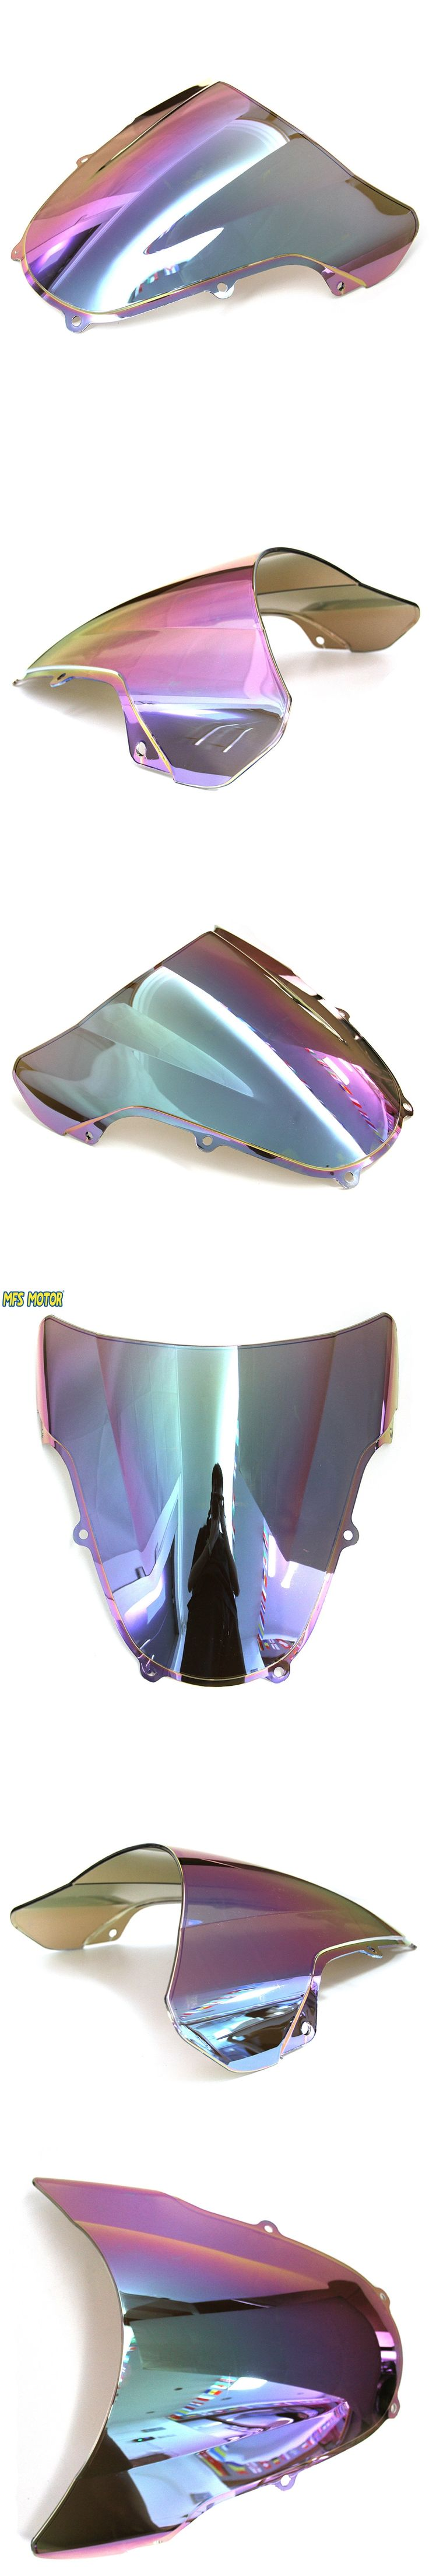 Adjustable Double Bubble Windshield Windscreen Variable Spoiler Panel For Suzuki GSXR 600/750 K1 2001 2002 2003 Light iridium